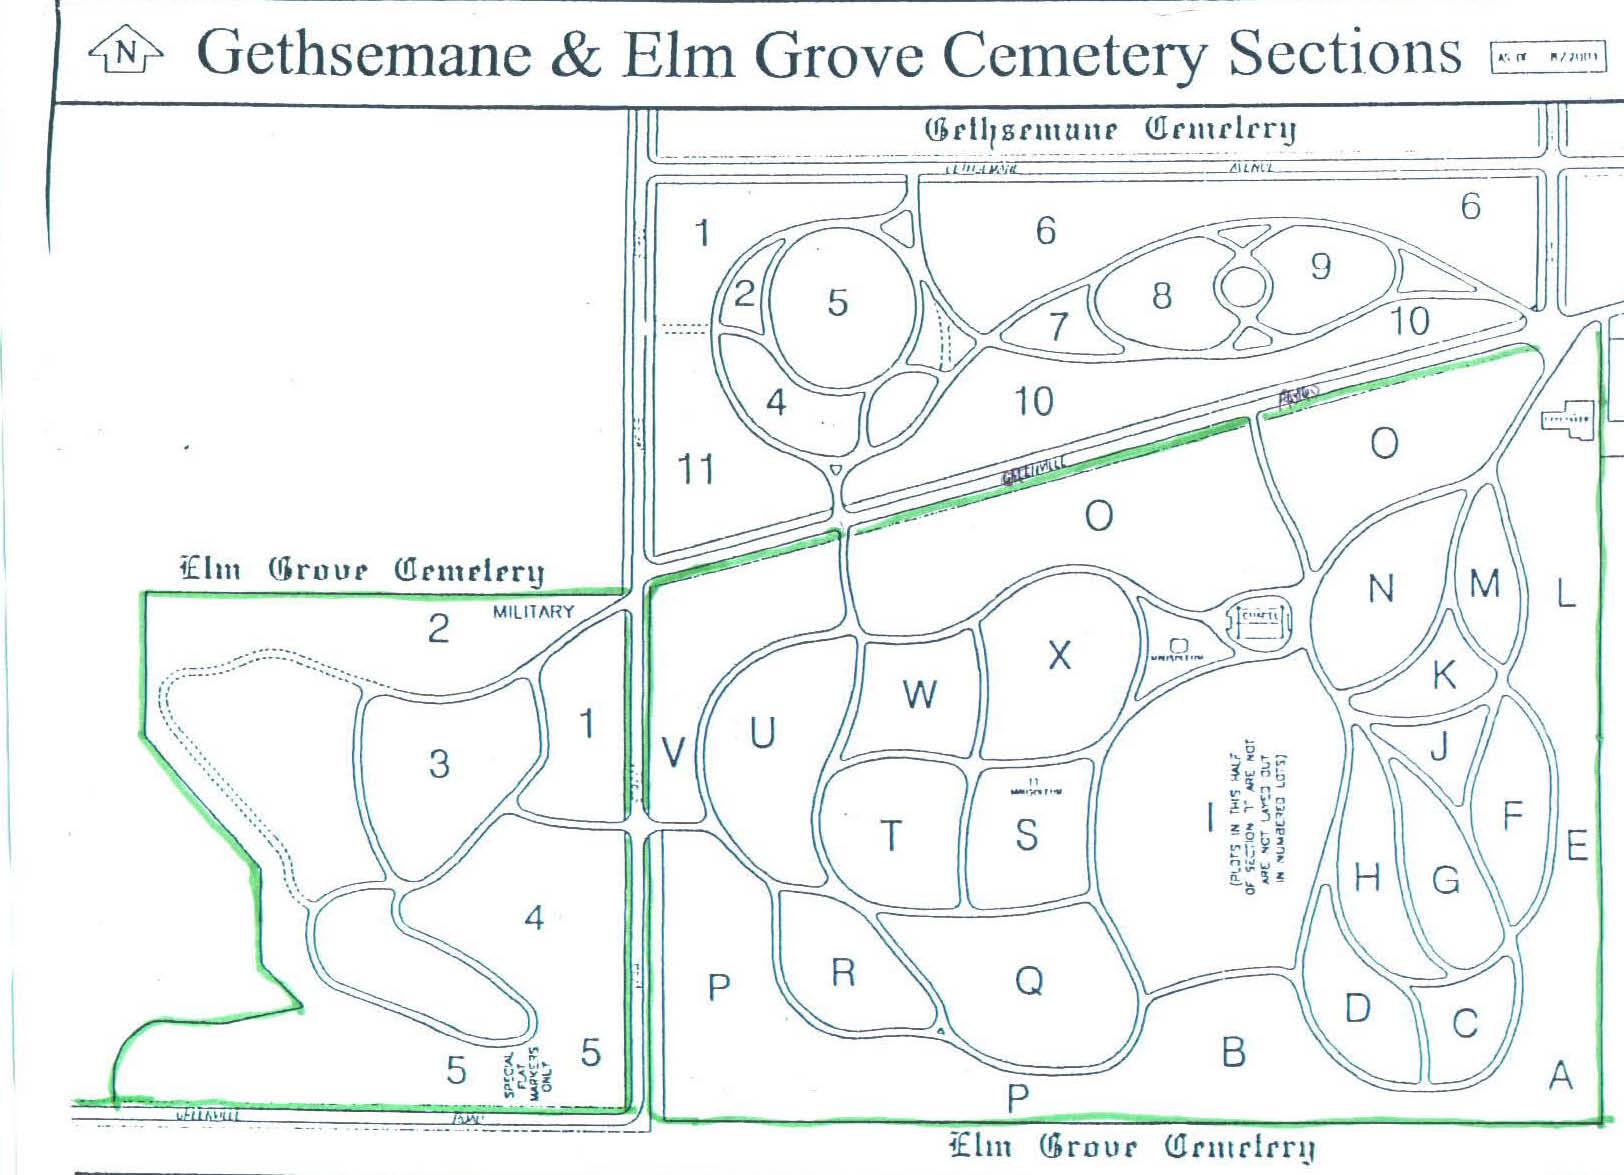 Gethsemane Catholic Cemetery